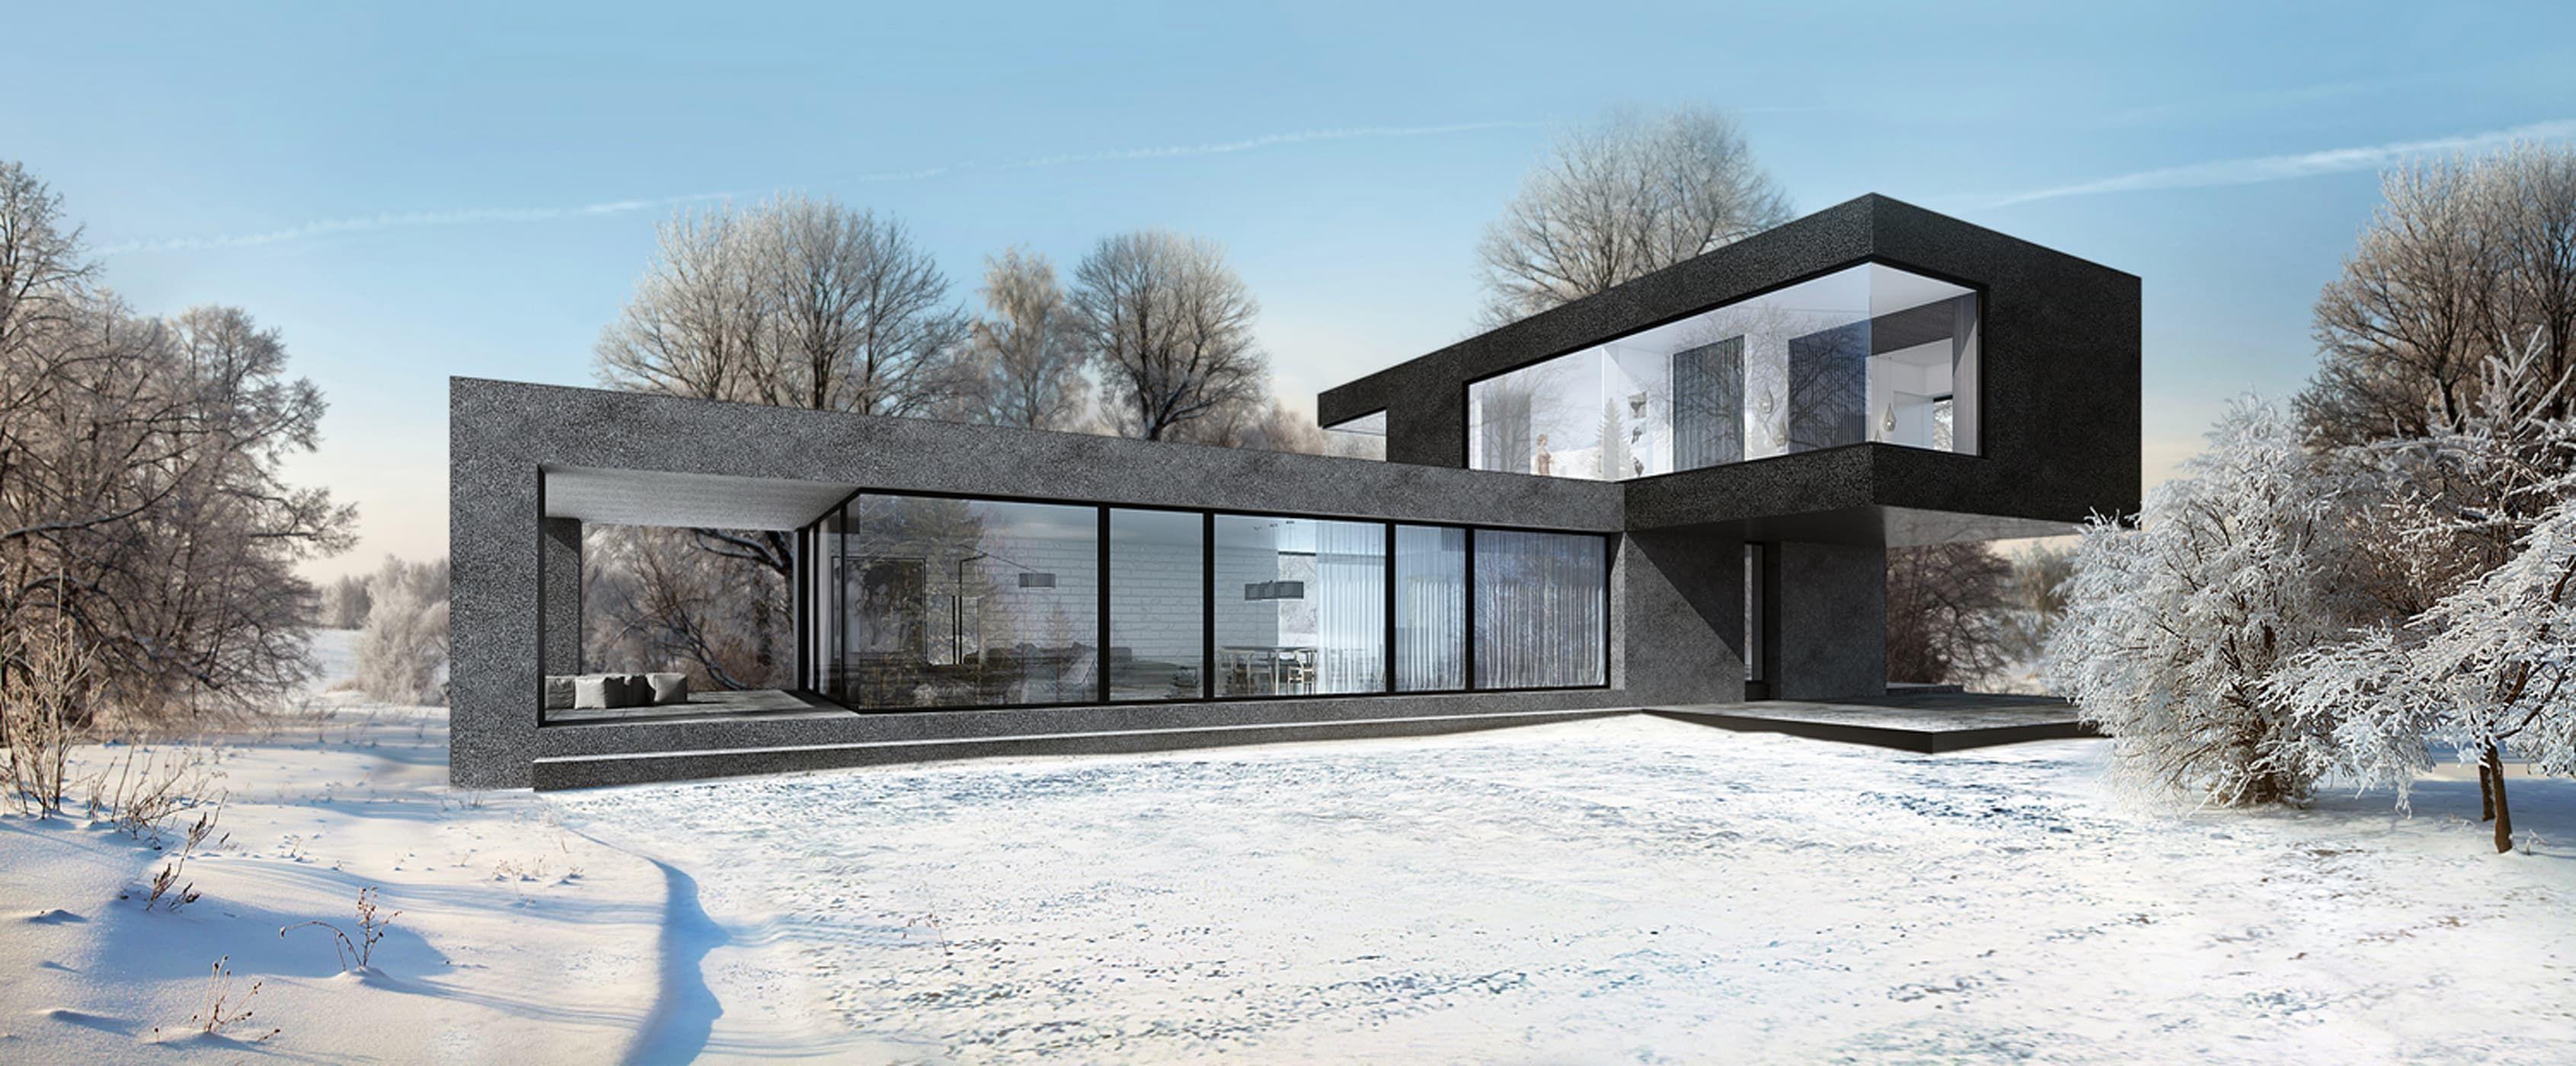 Casas minimalistas de alexander zhidkov architect